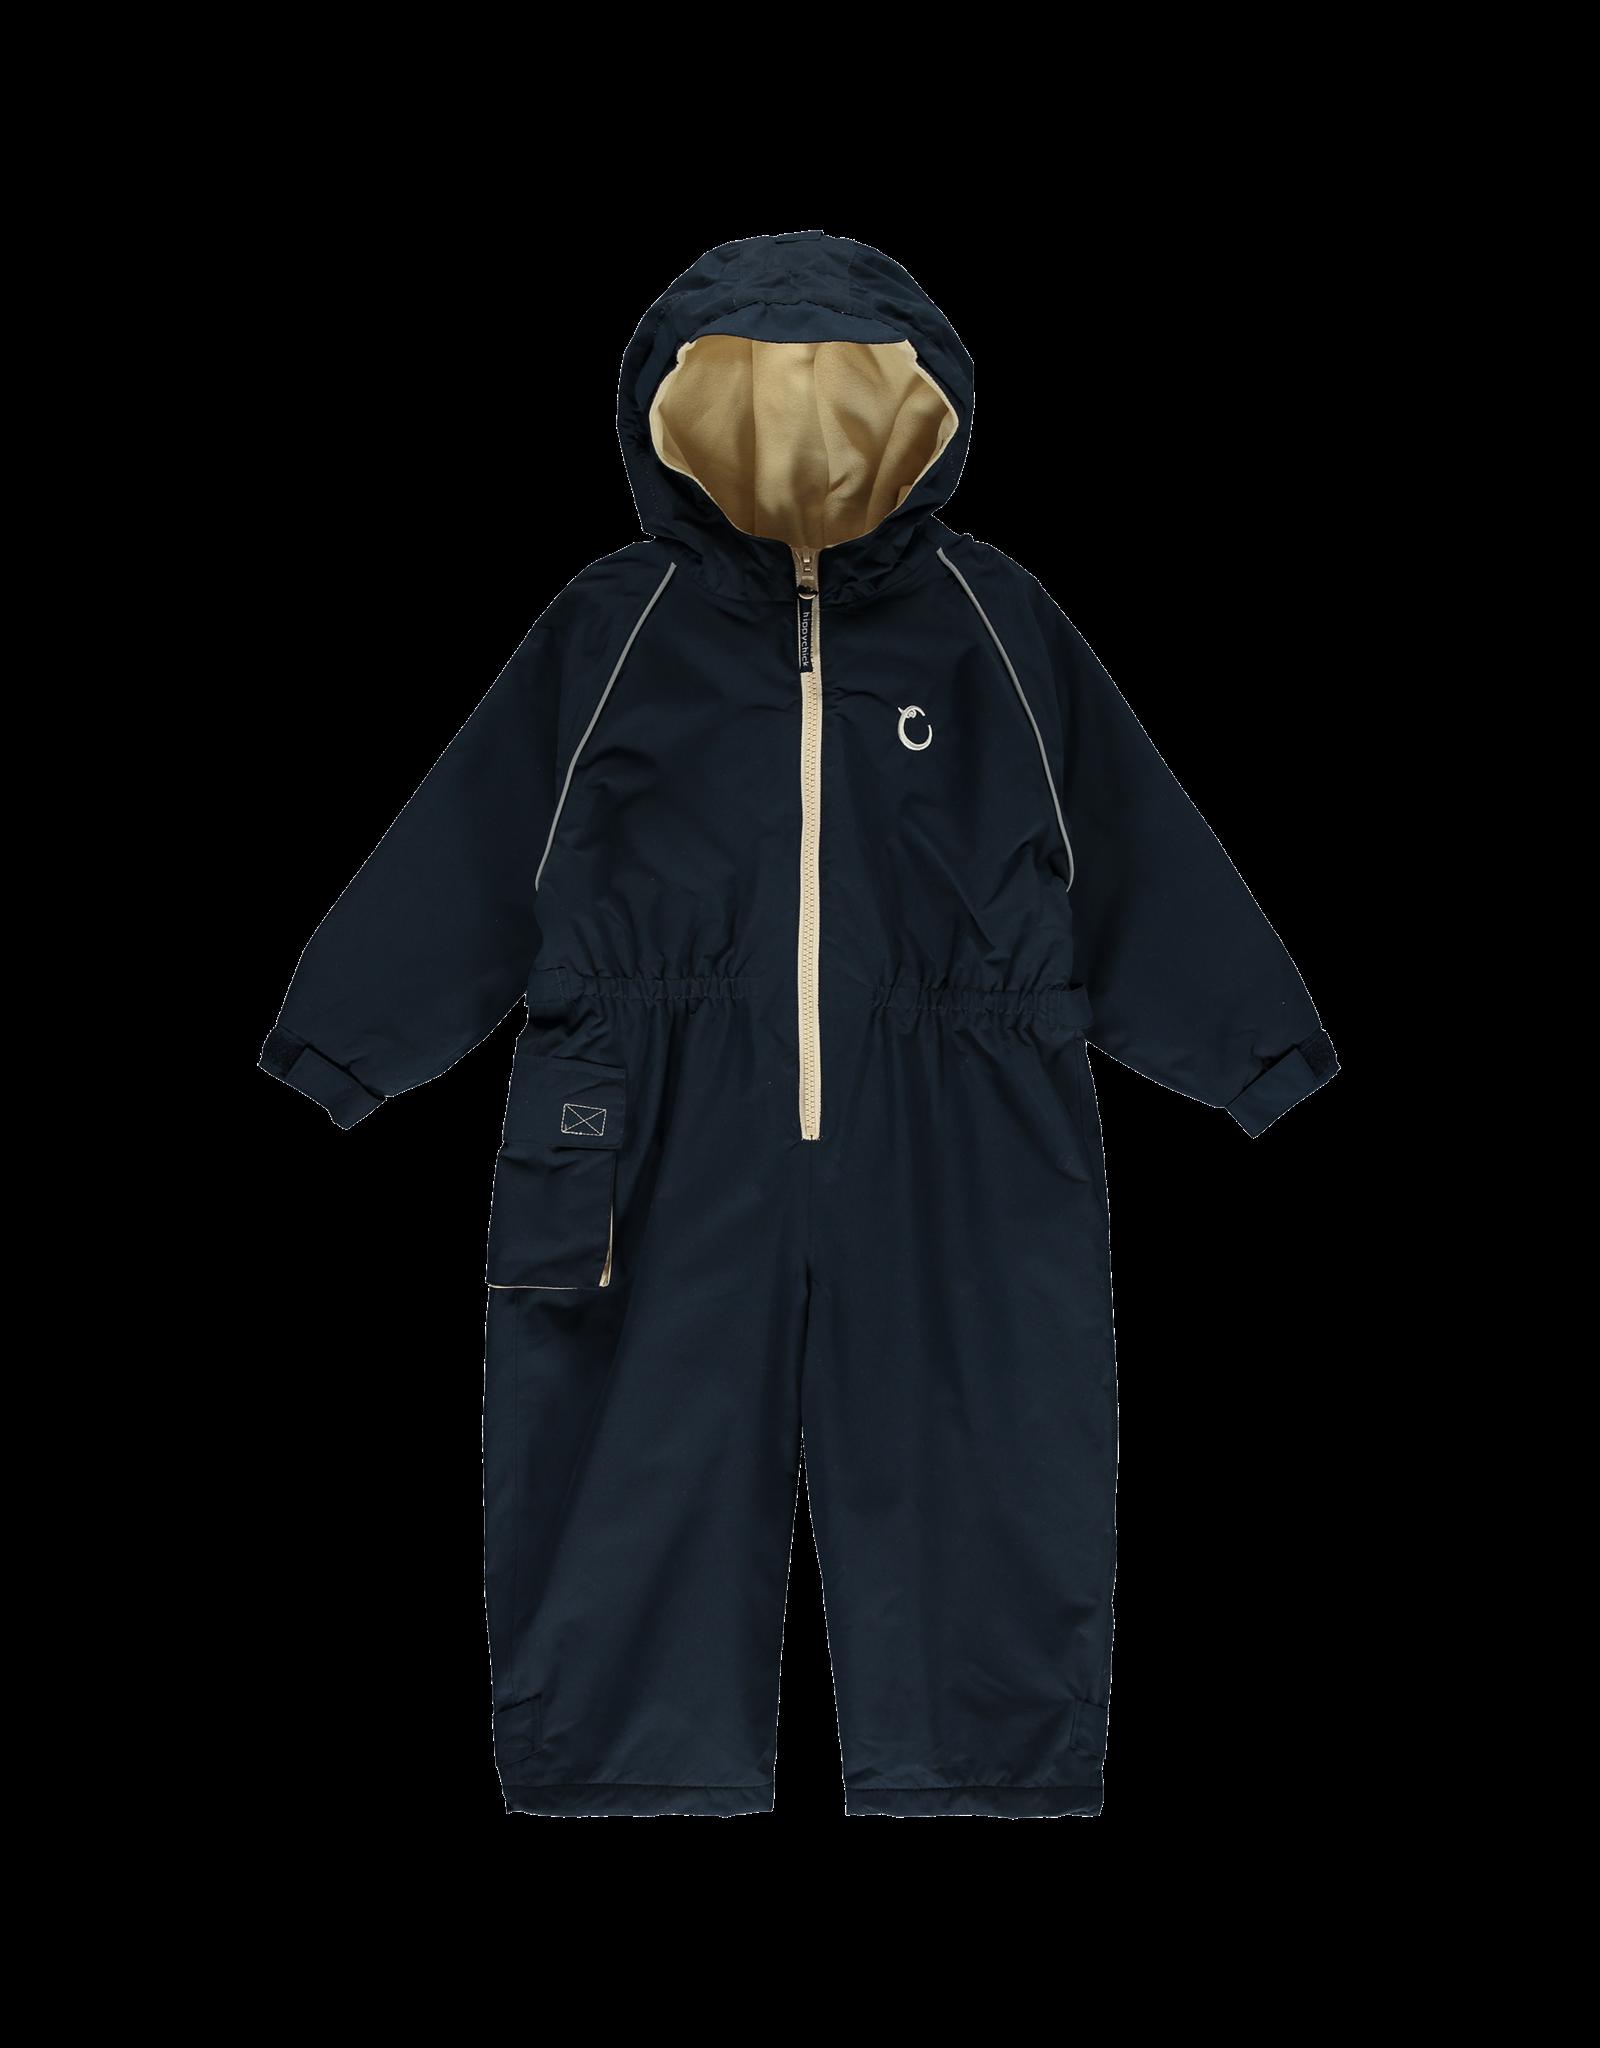 Toddler waterproof Fleece Lined Suit- Midnight Blue